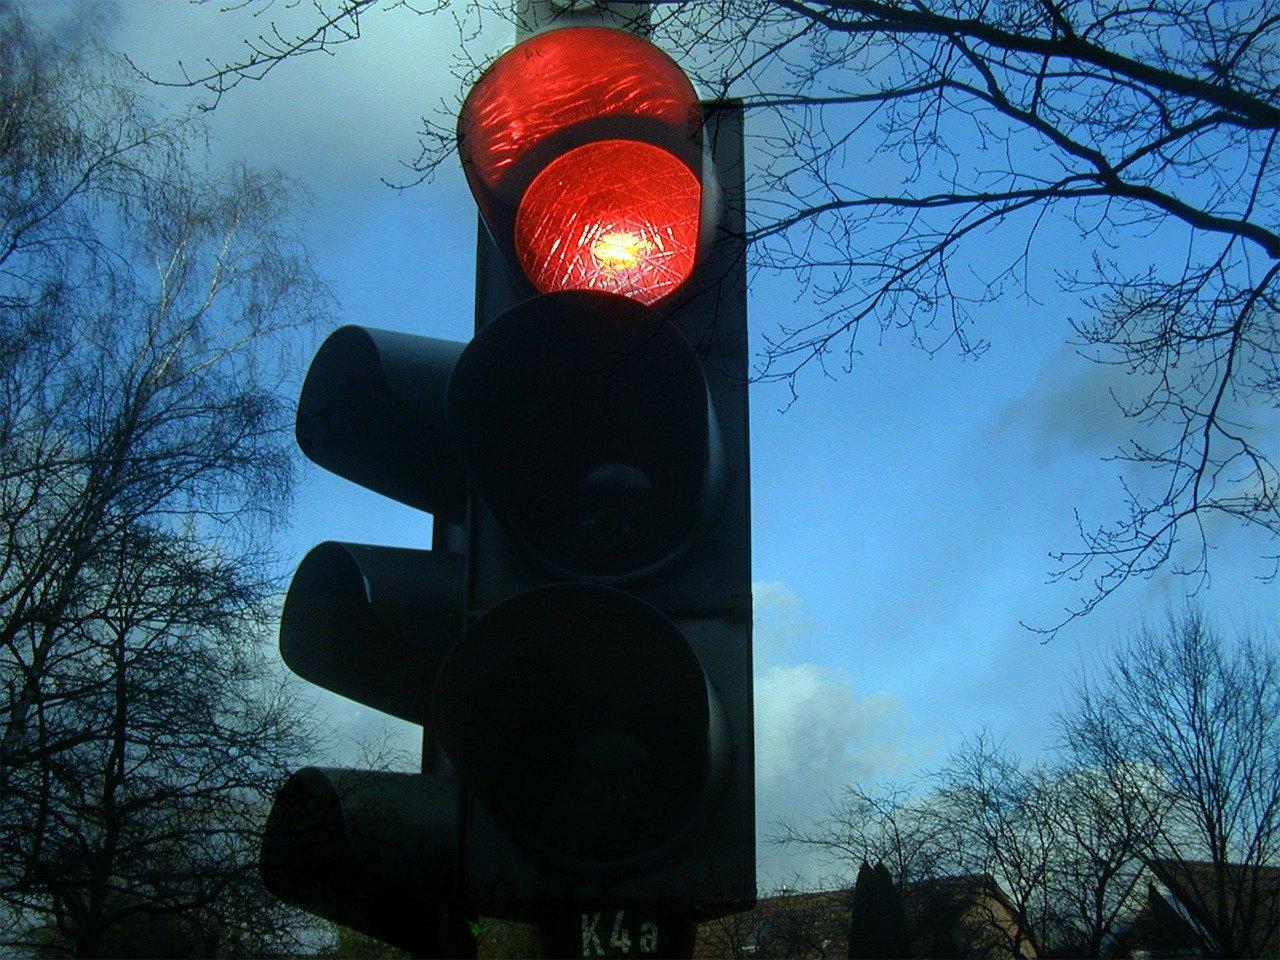 SANACIJA ULICE  Zabrana saobraćaja za sve vrste motornih vozila